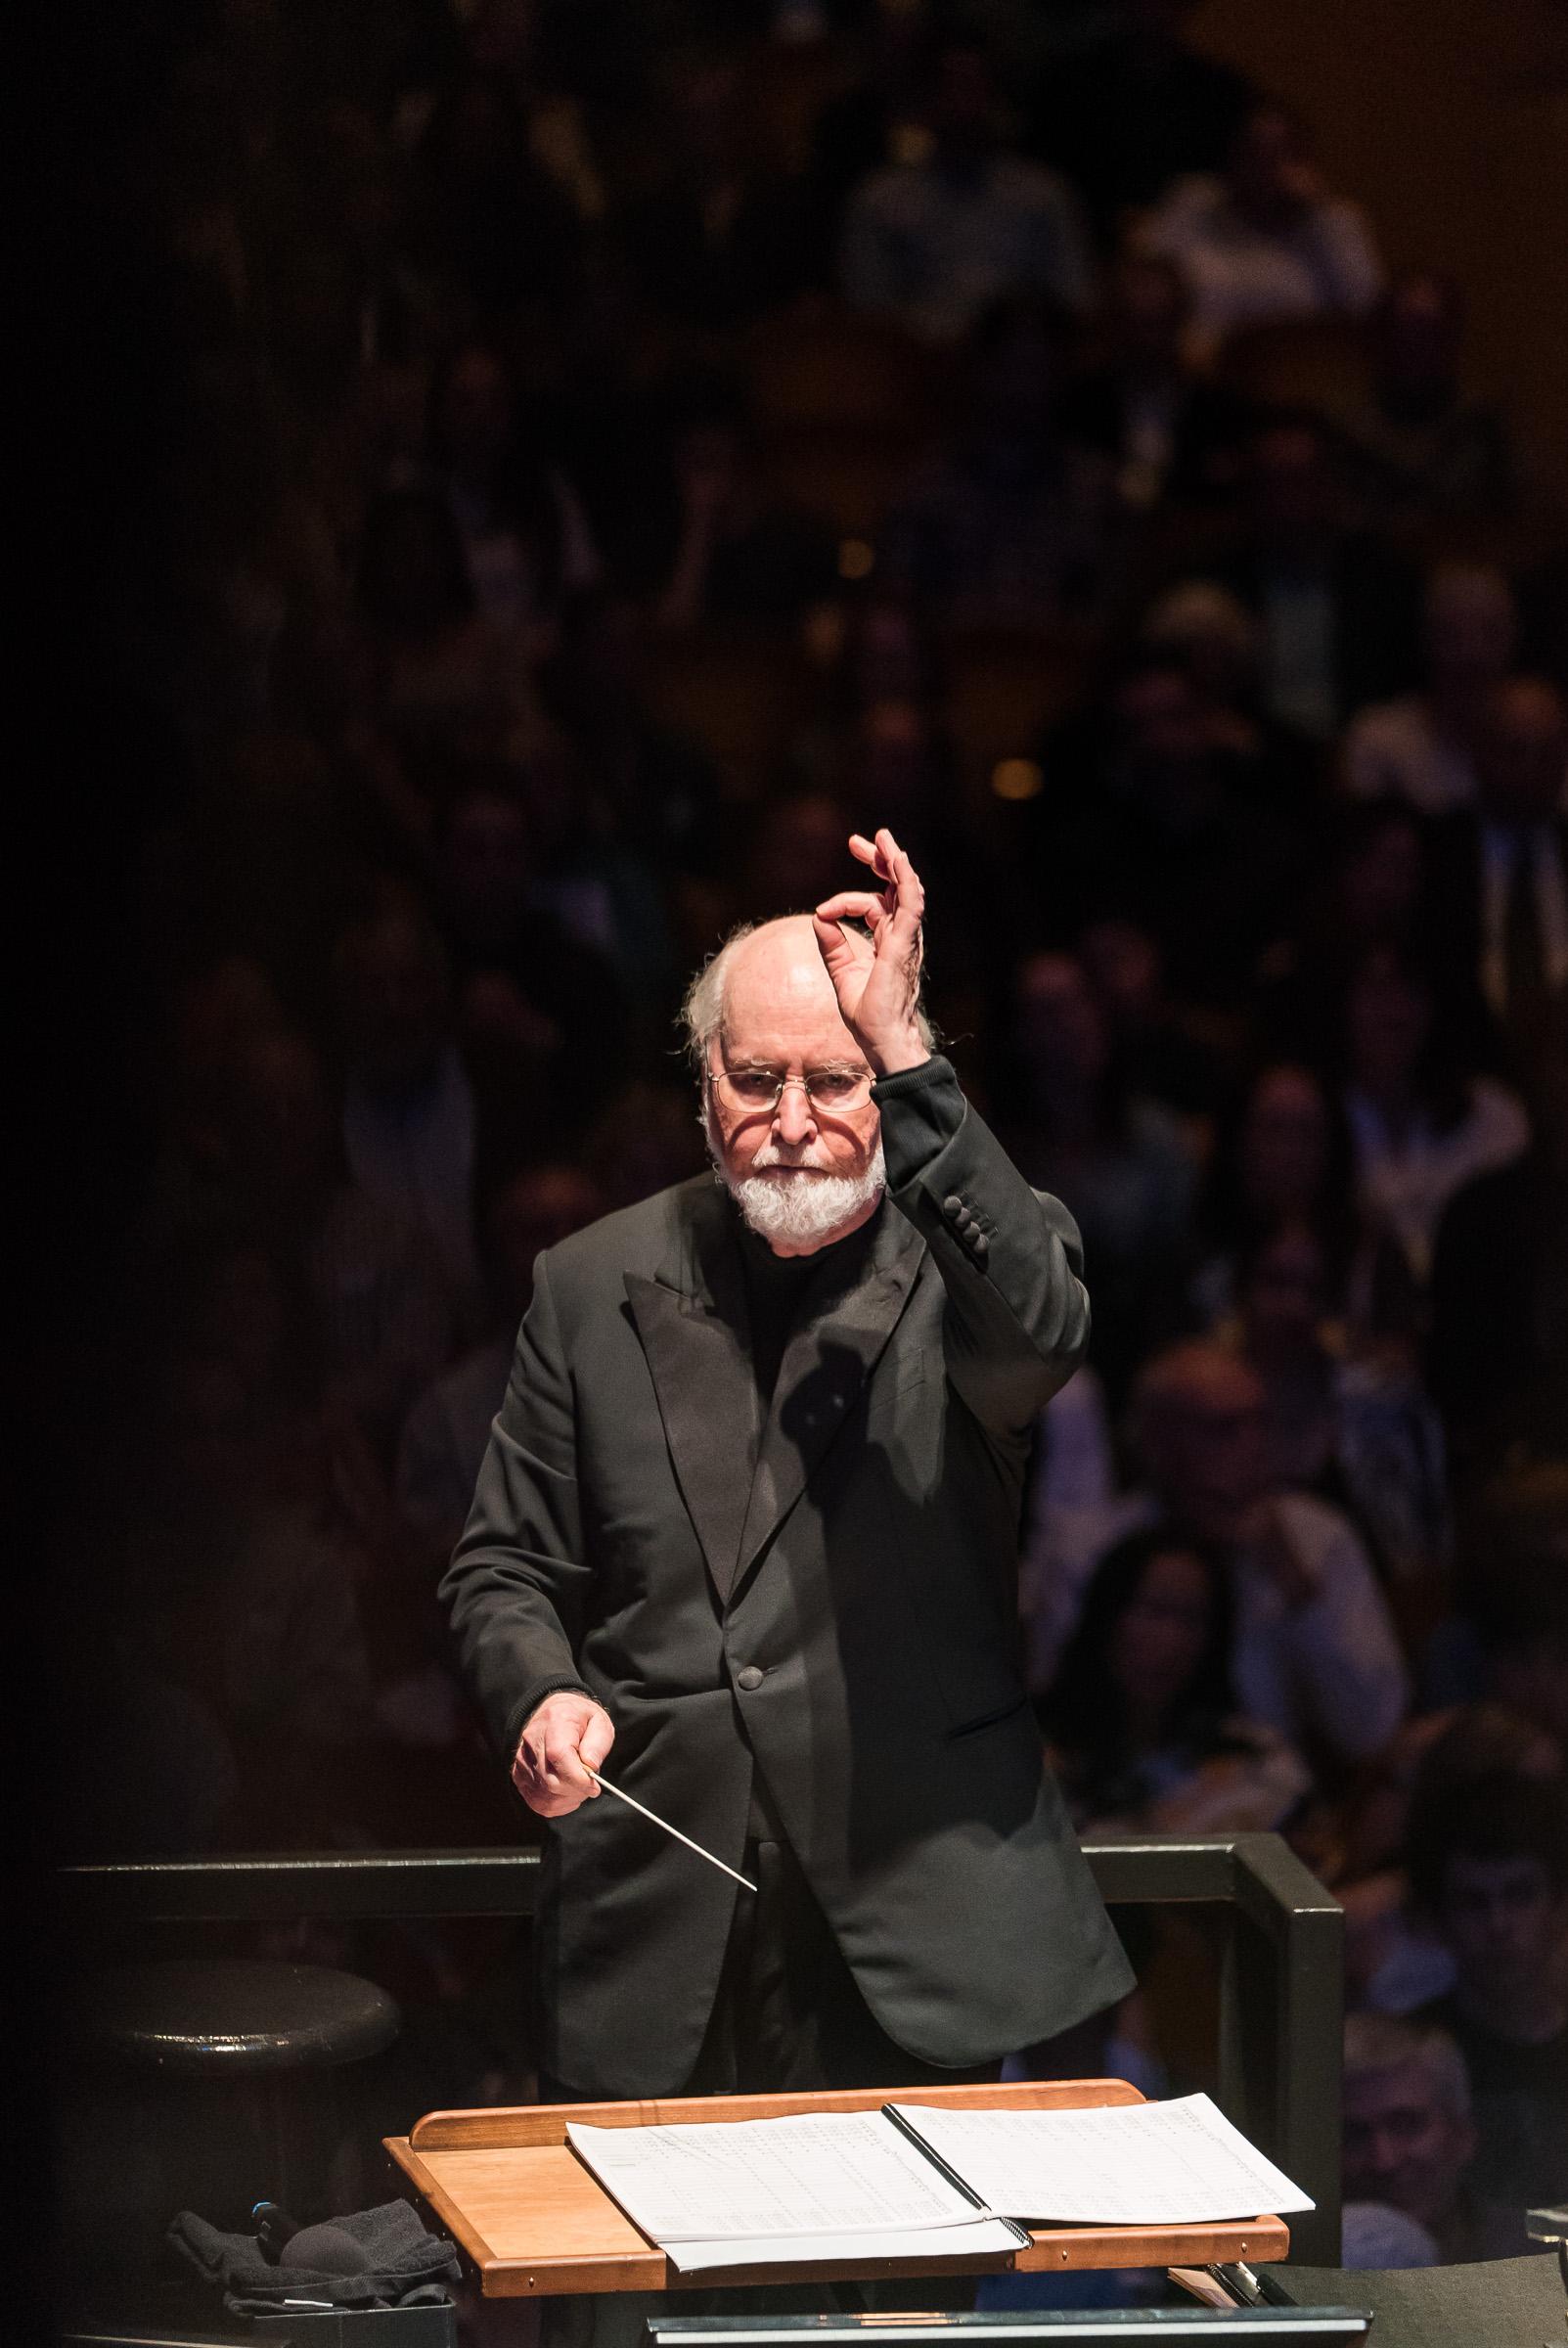 brandon_patoc_john_williams_Steven_Spielberg, Seattle_Symphony_Orchestra_Conert_0044.JPG